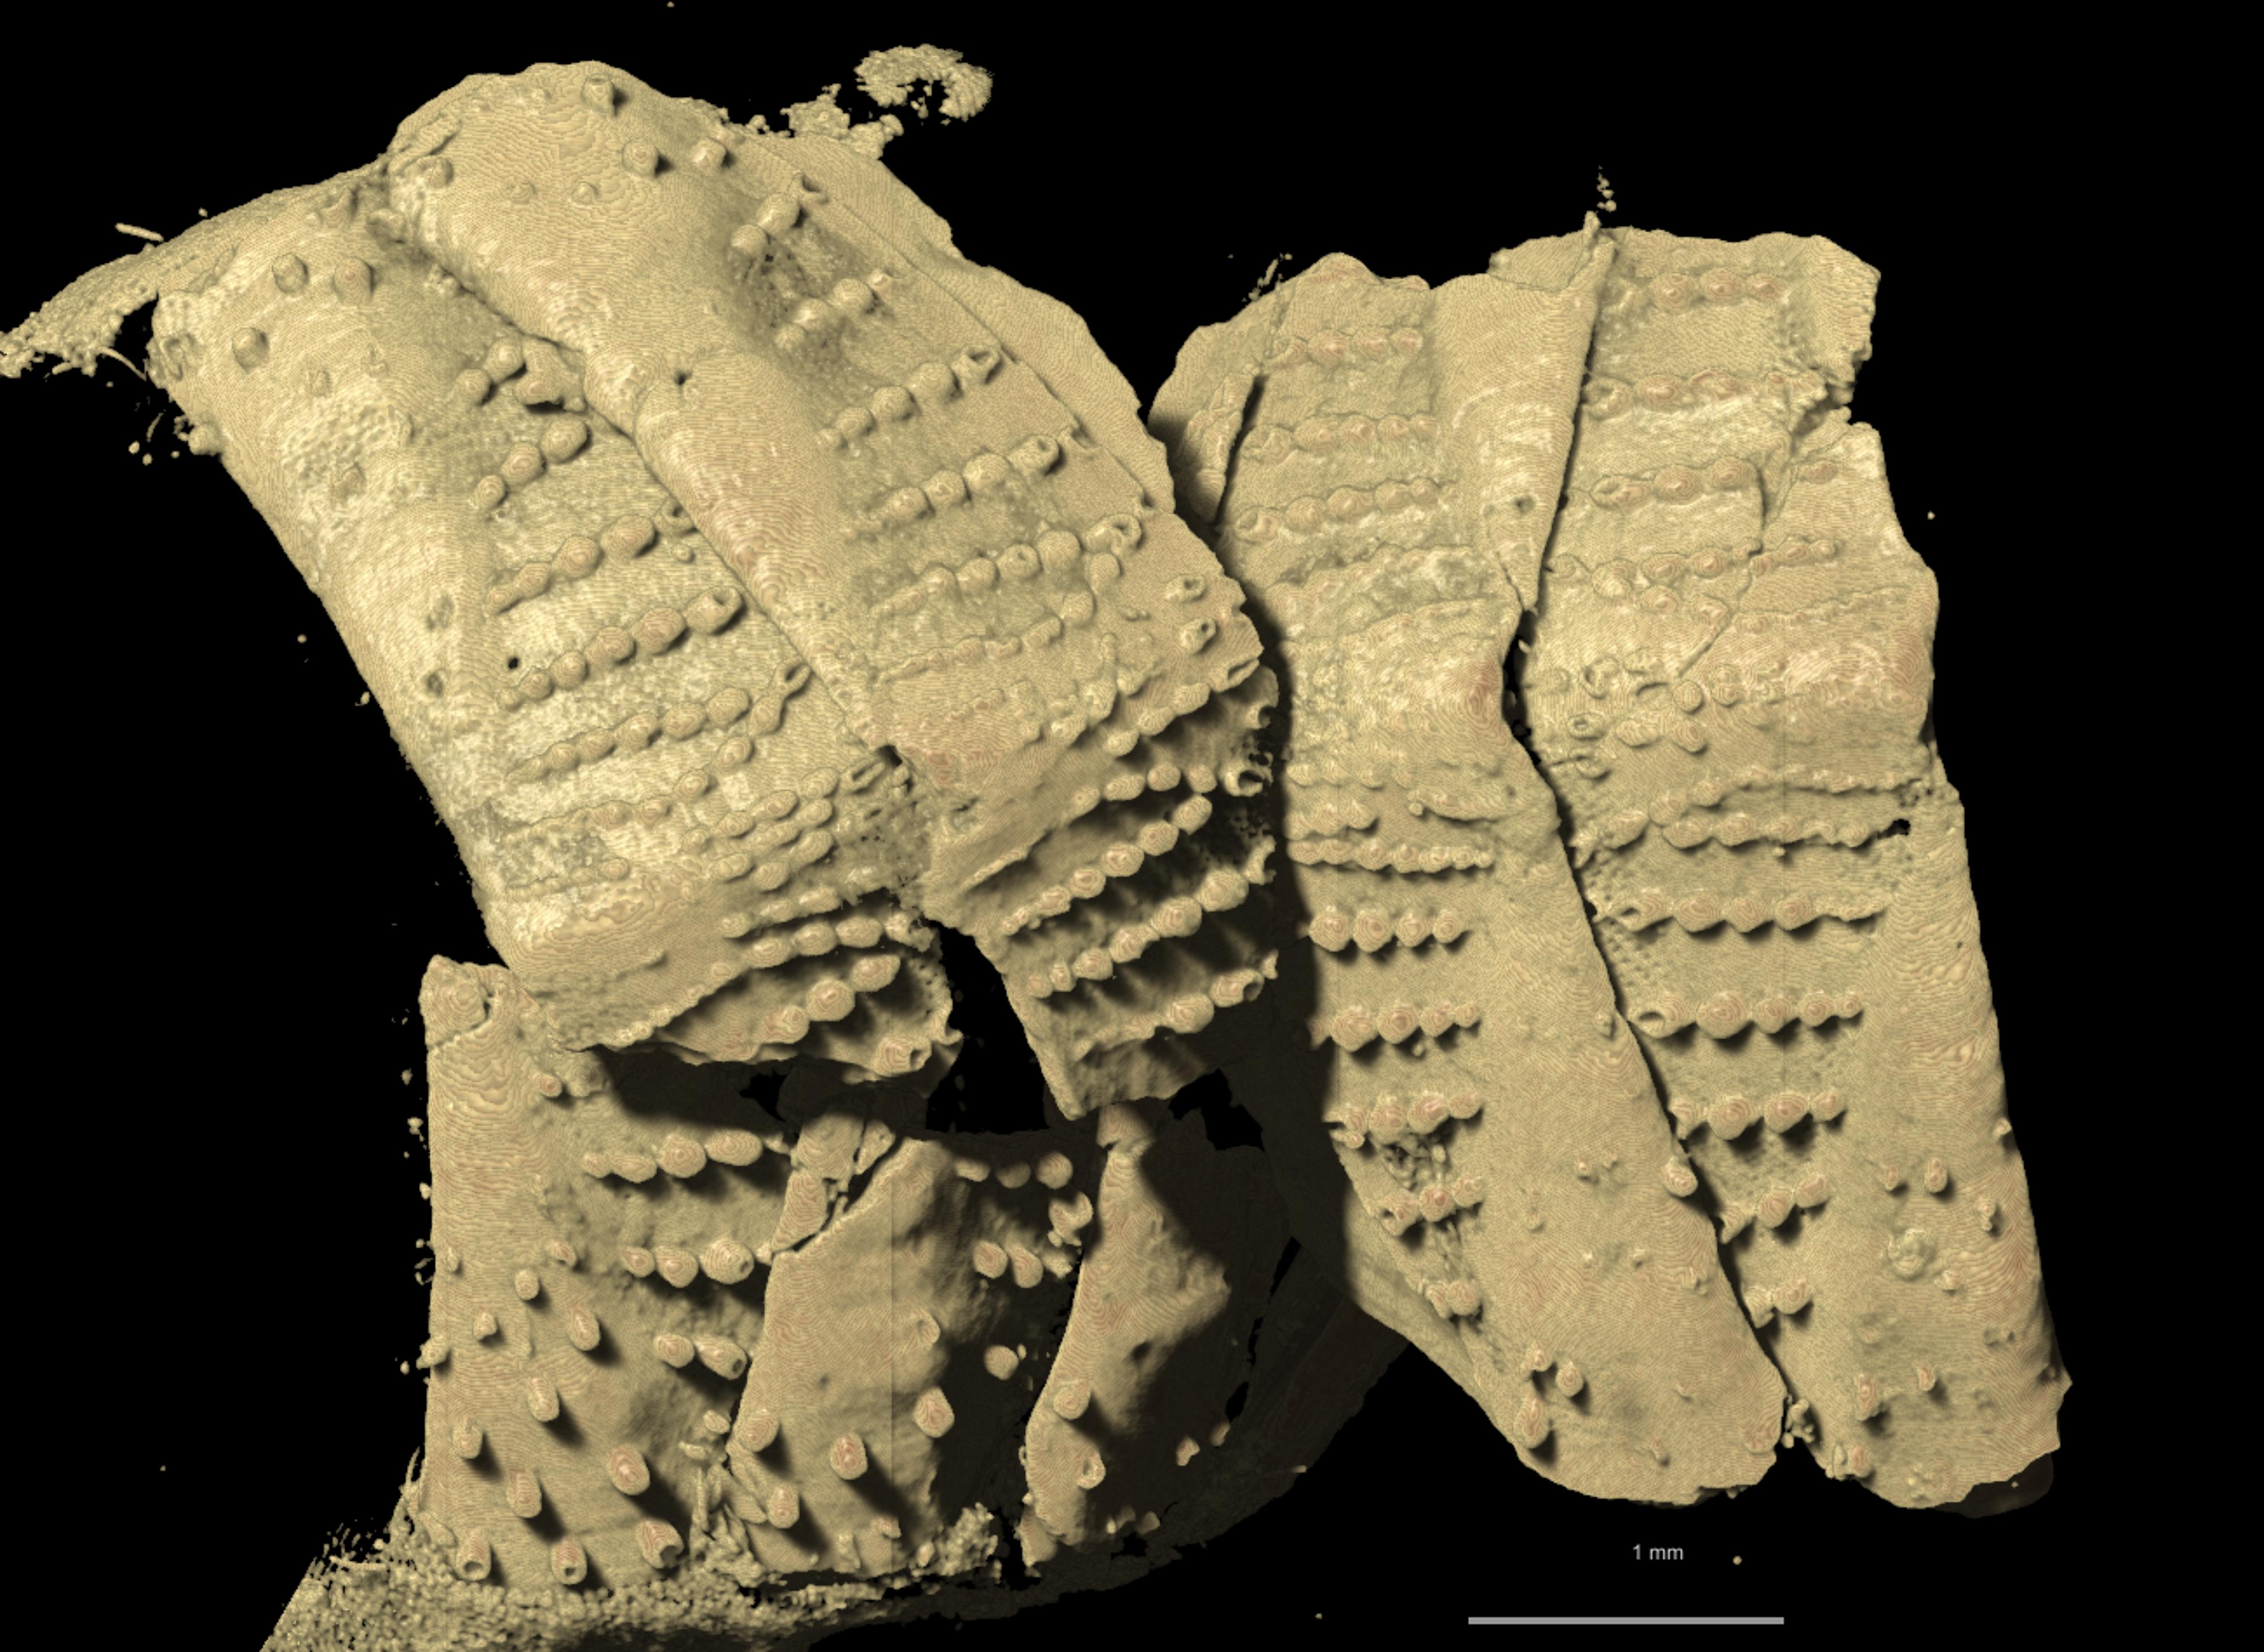 BE-RBINS-INV HOLOTYPE MT.3620/1 Chaetopleura unilineata CARCASS.jpg